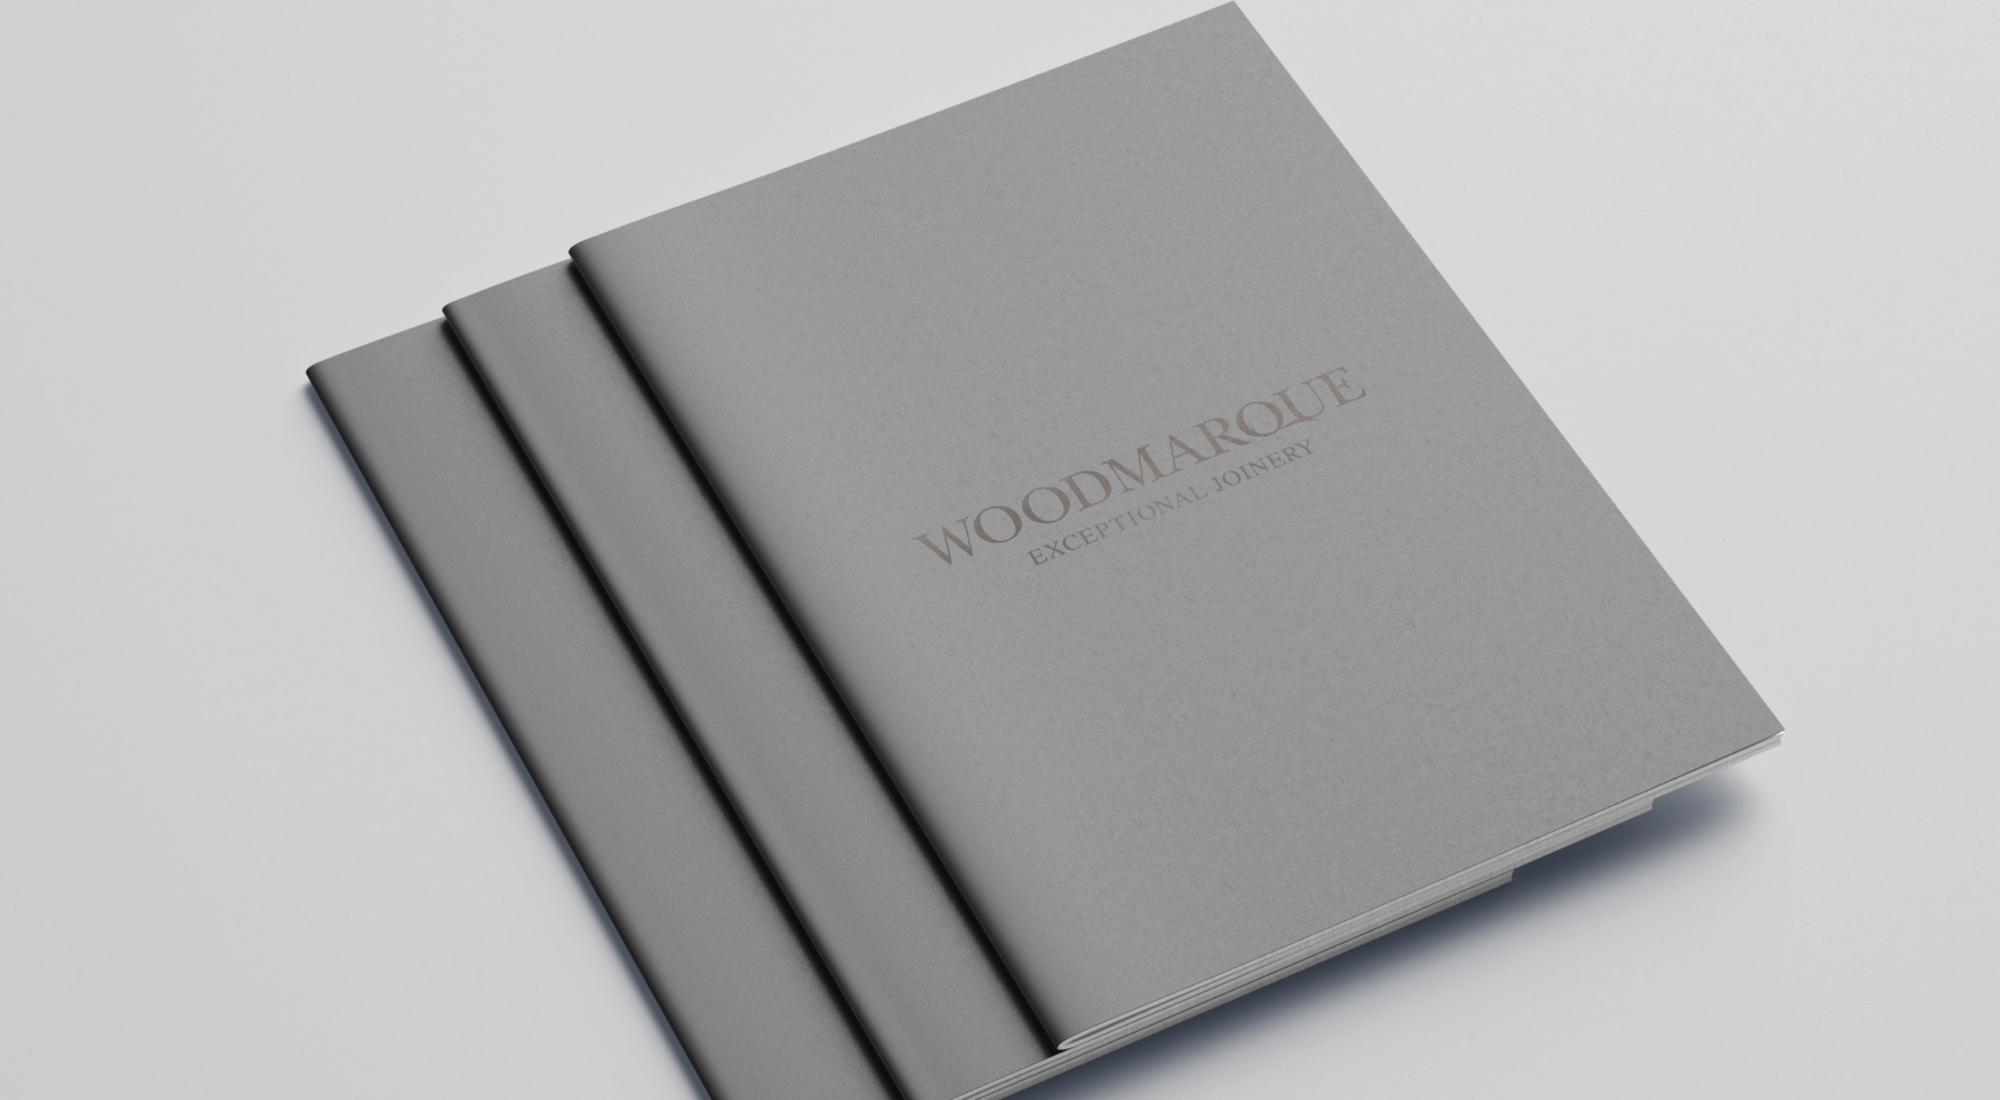 https://alanjacksondesign.co.uk/wp-content/uploads/2021/09/woodmarque-joinery-img3.jpg